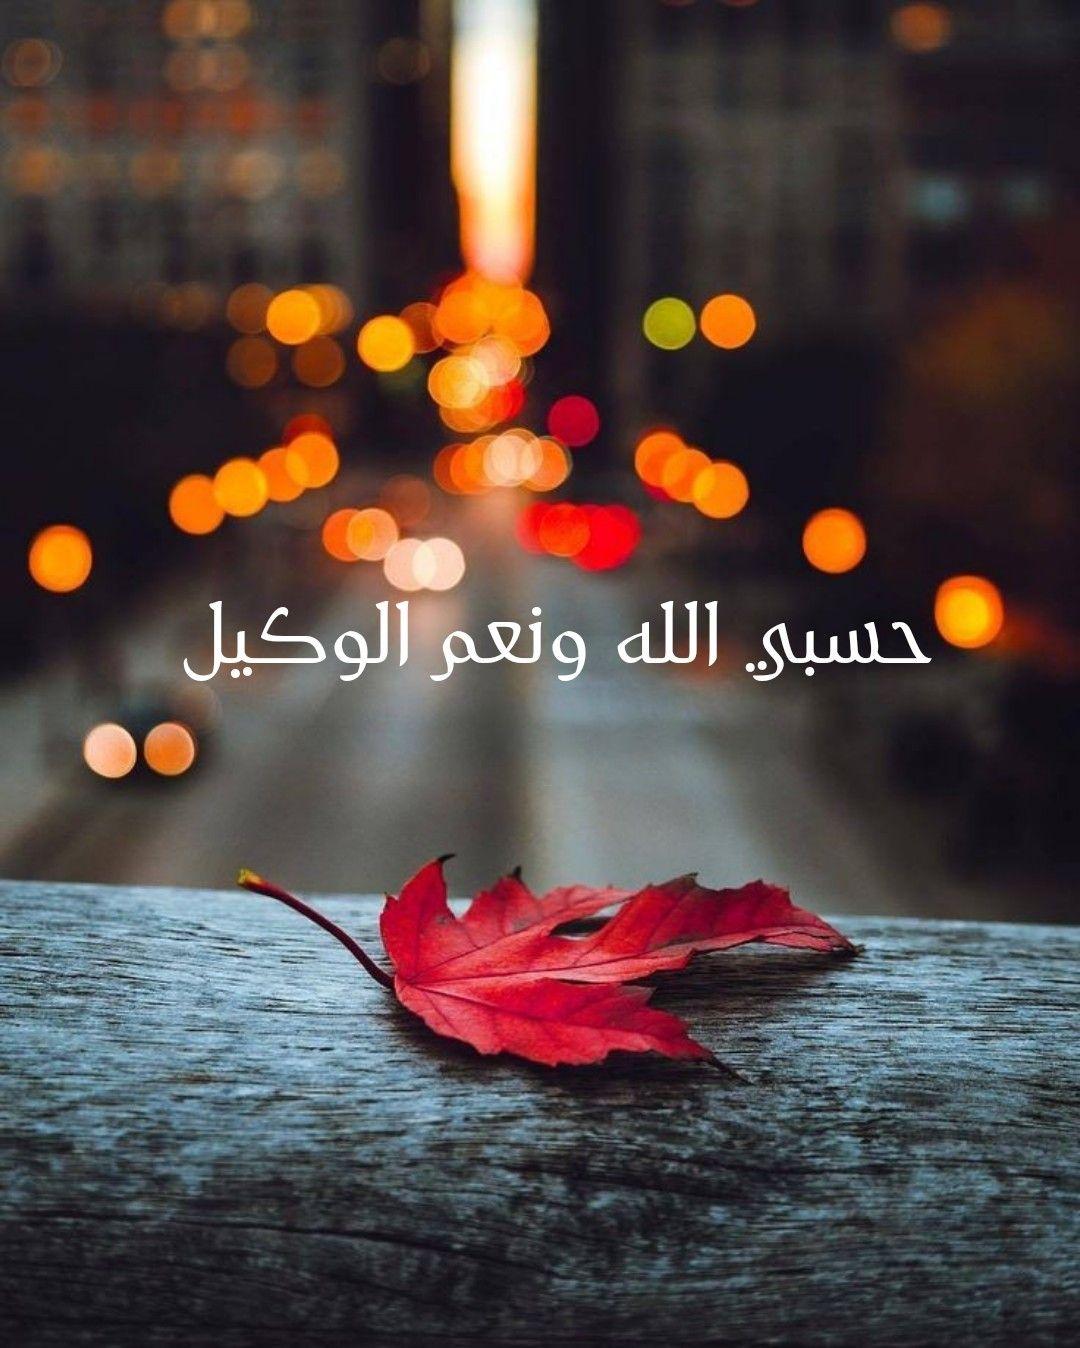 حسبي الله ونعم الوكيل Islamic Images Arabic Tattoo Quotes Joker Wallpapers